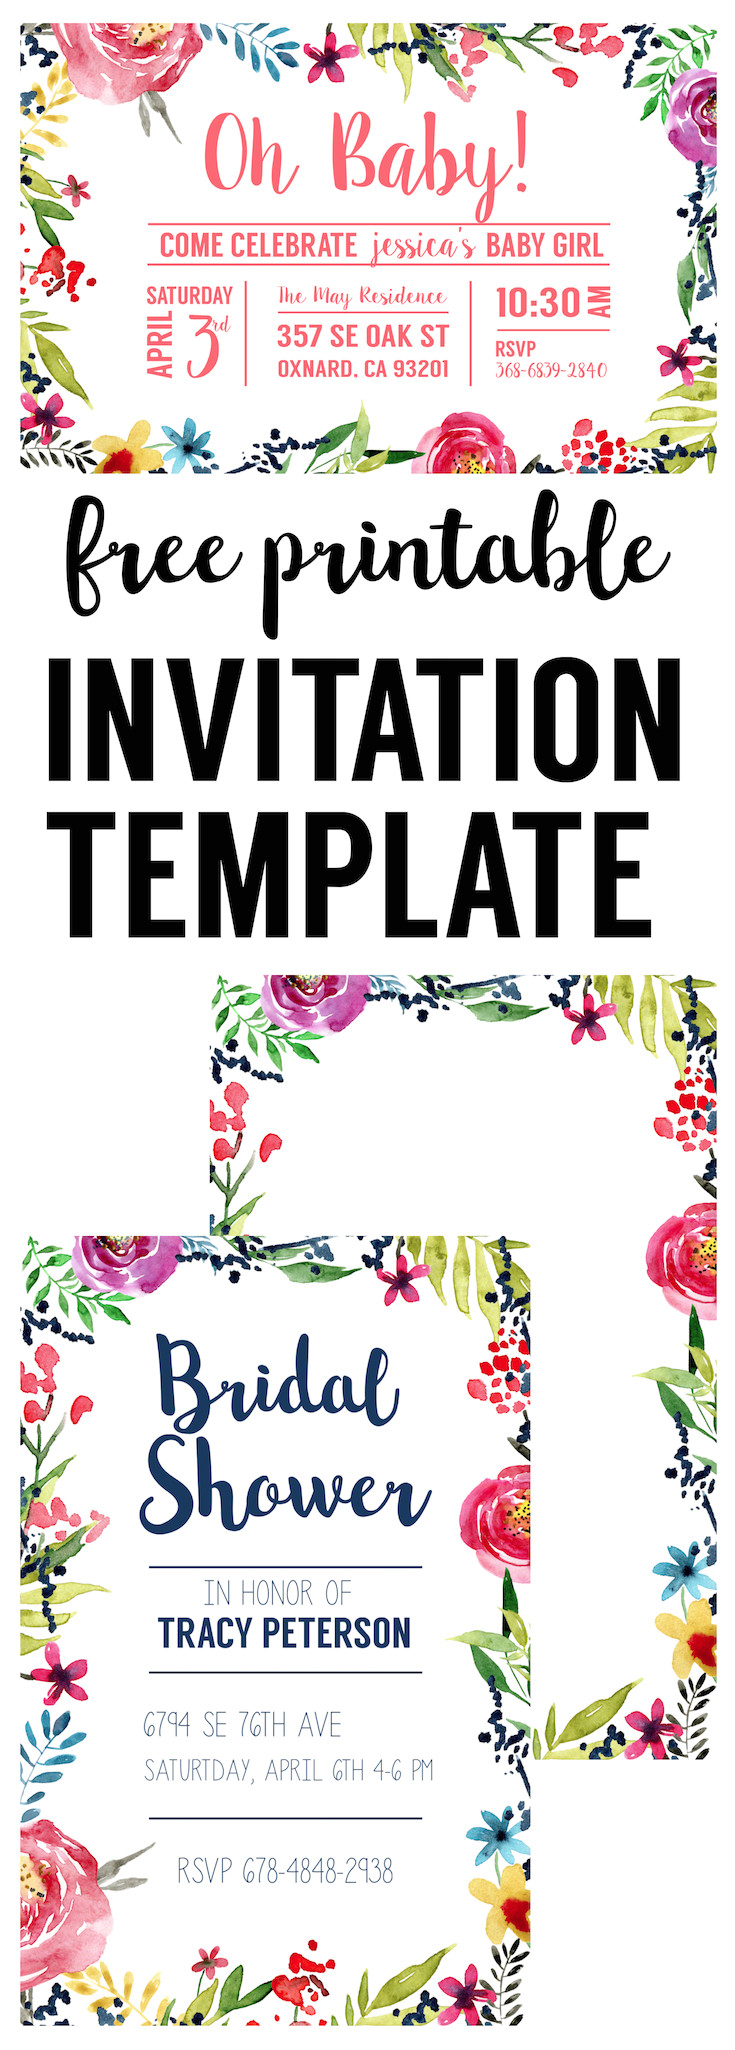 floral borders invitations free printable templates